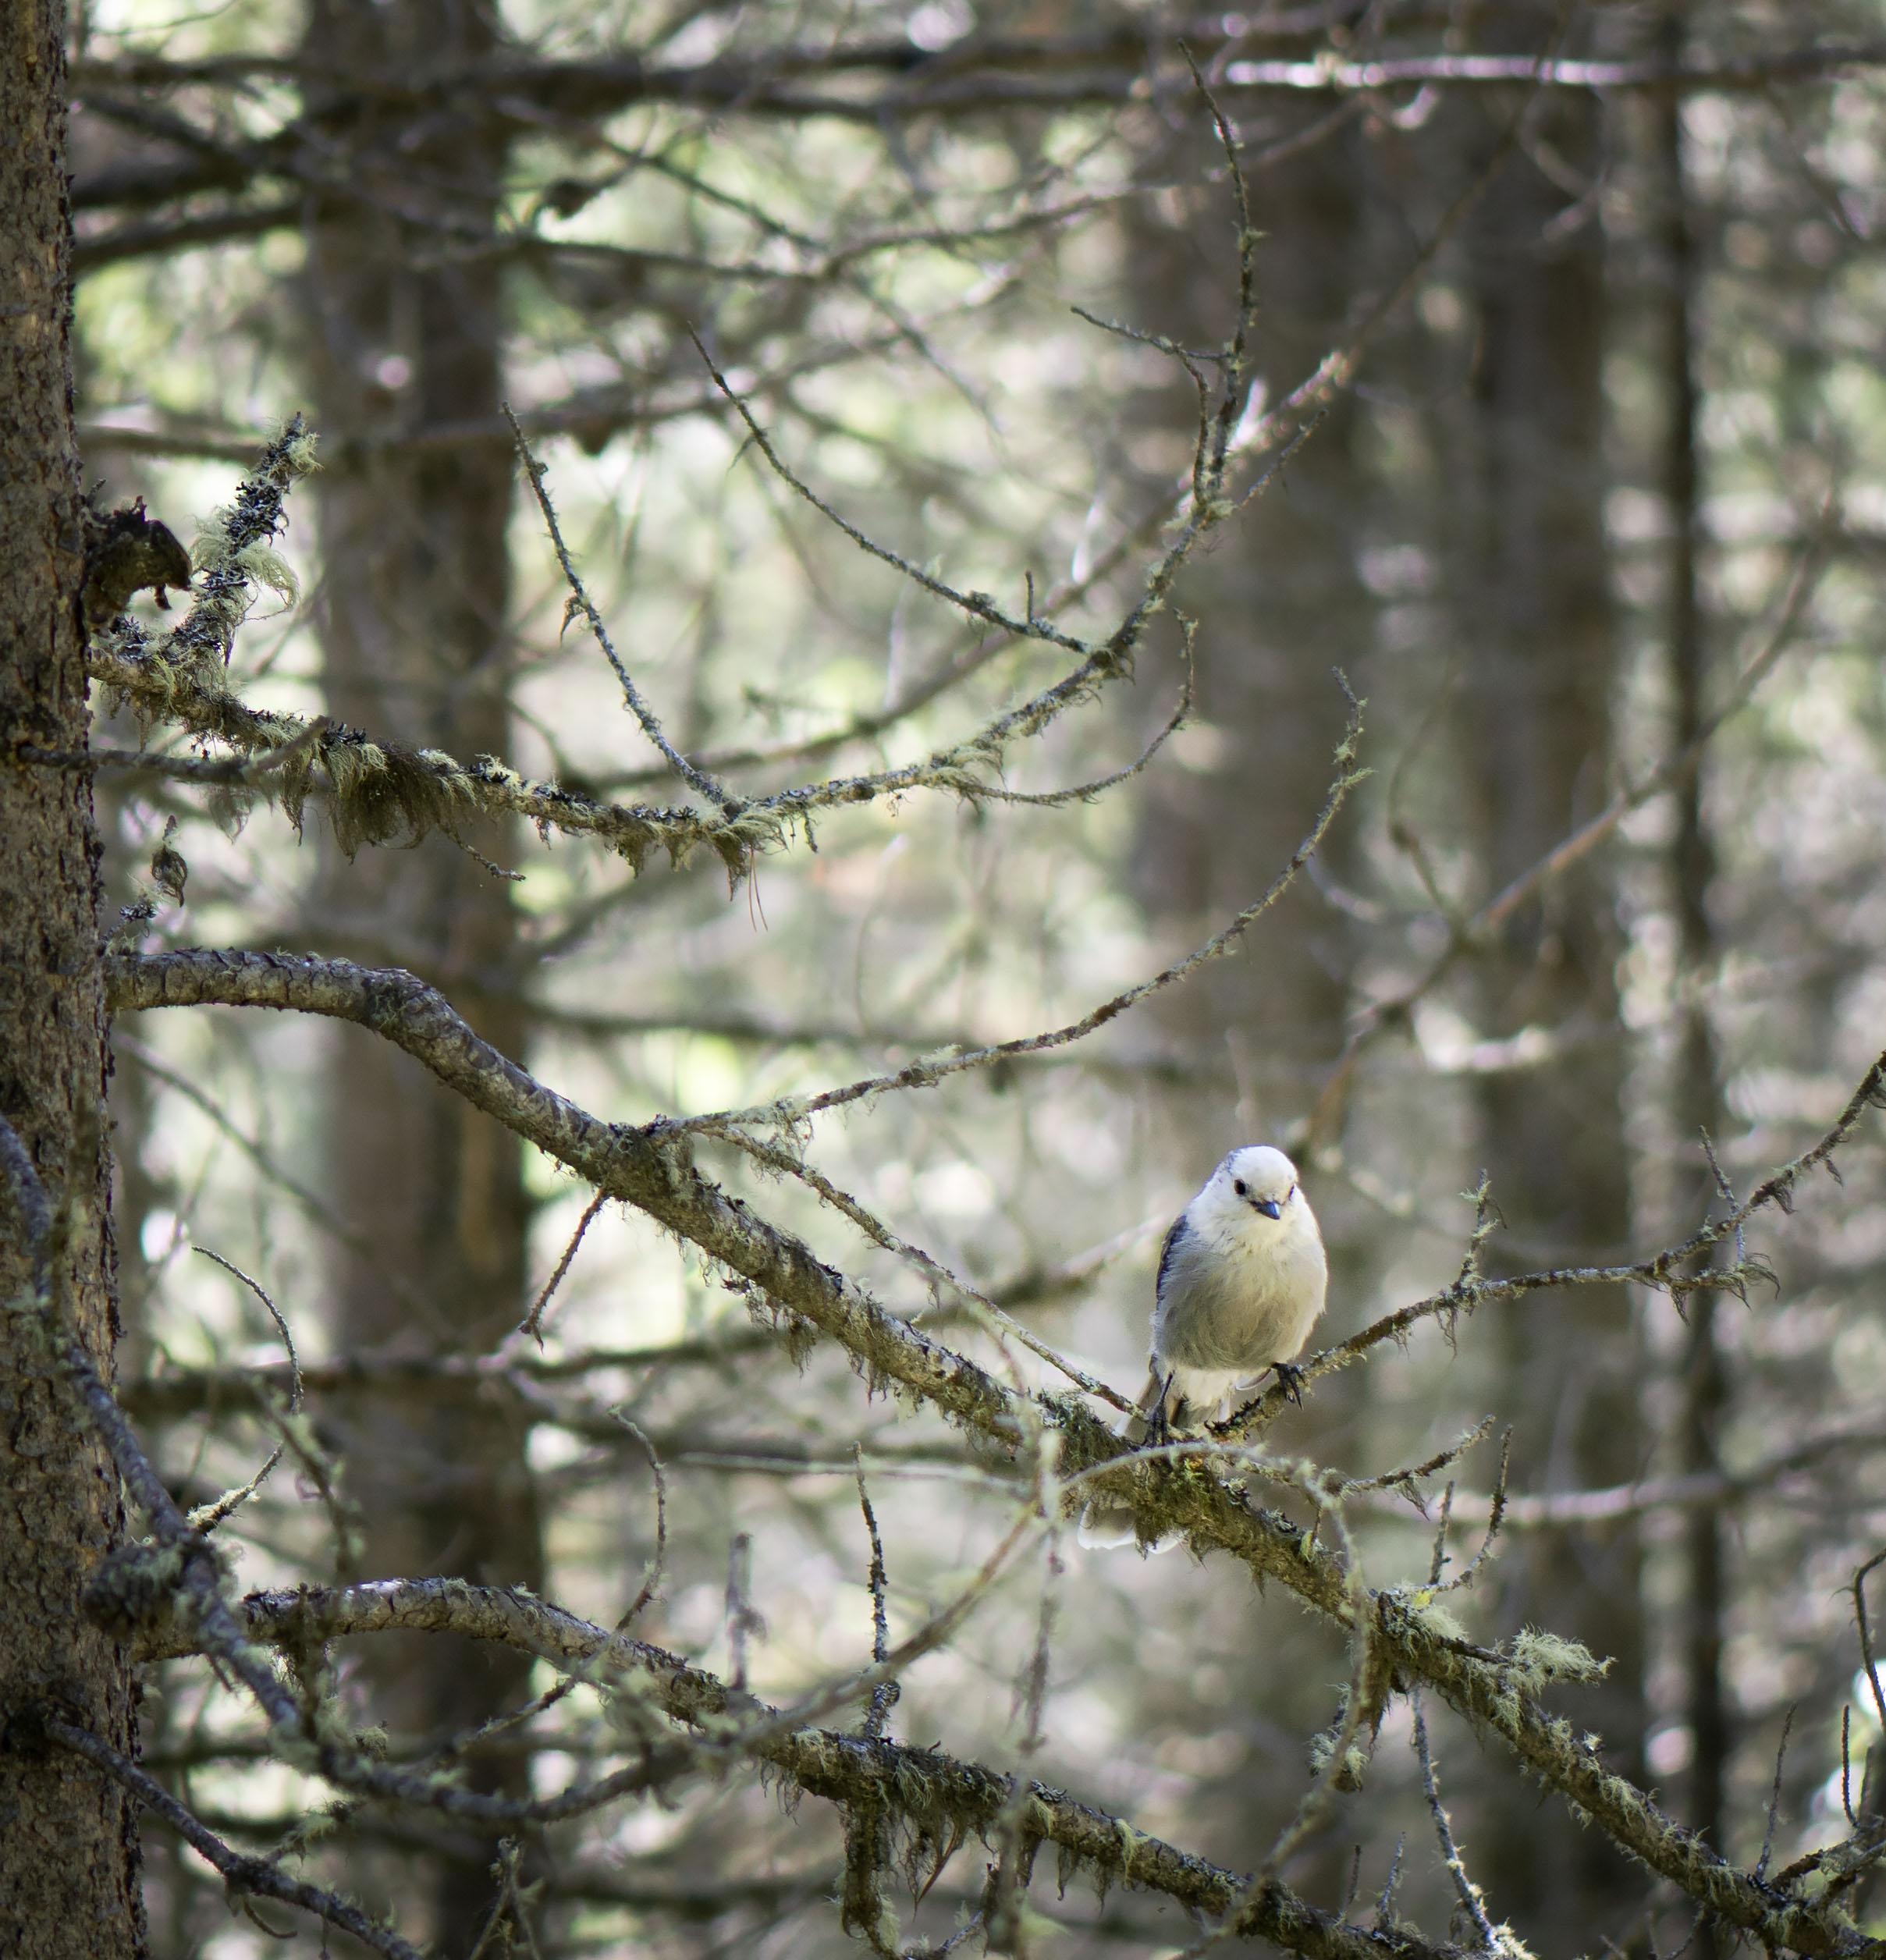 In_a_lichen_filled_forest_1